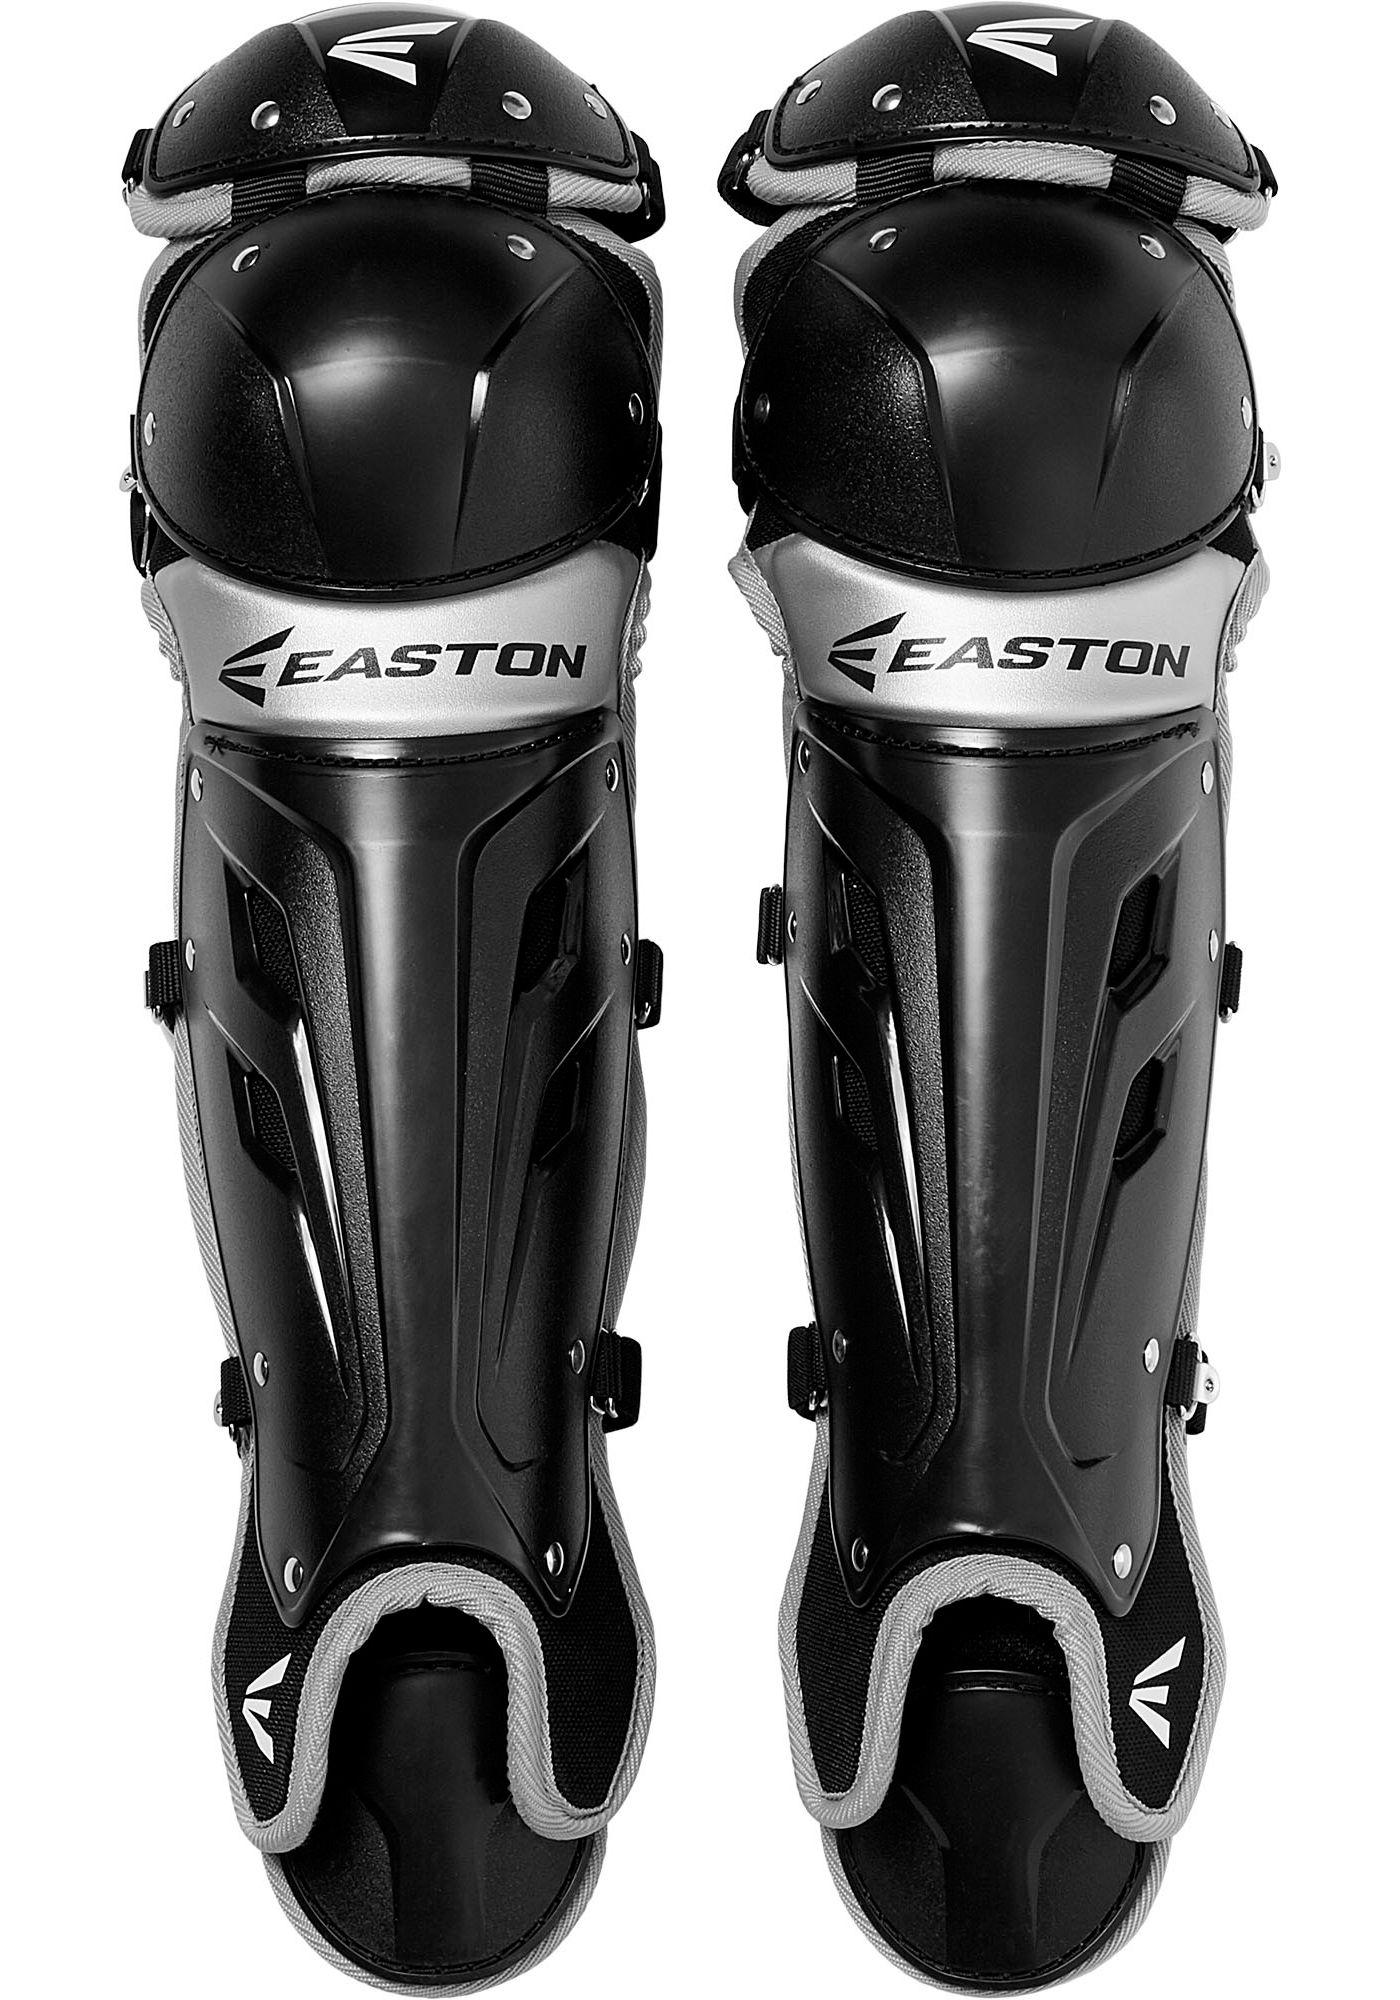 Easton Intermediate 14'' Gametime Elite Leg Guards